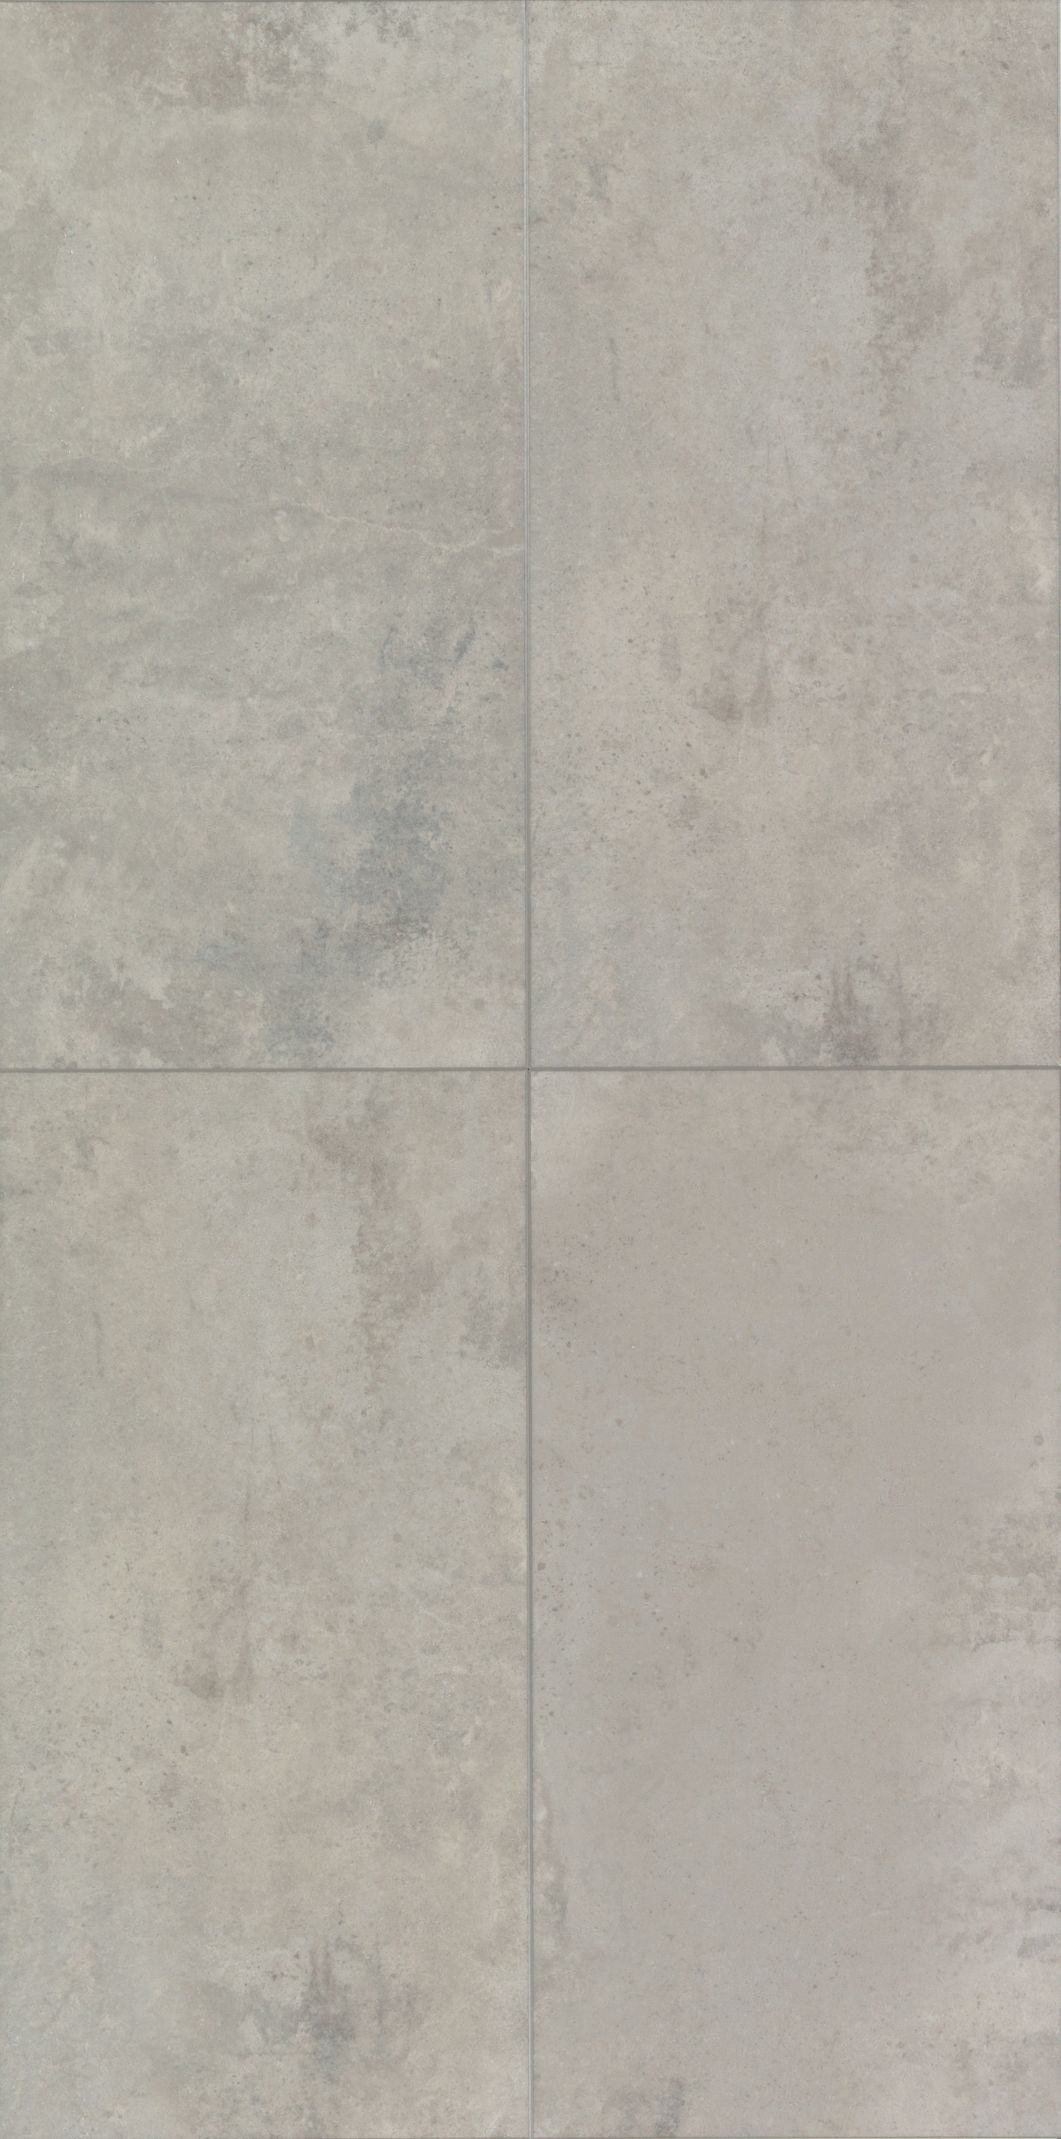 Blended Tones Pebblestone 925